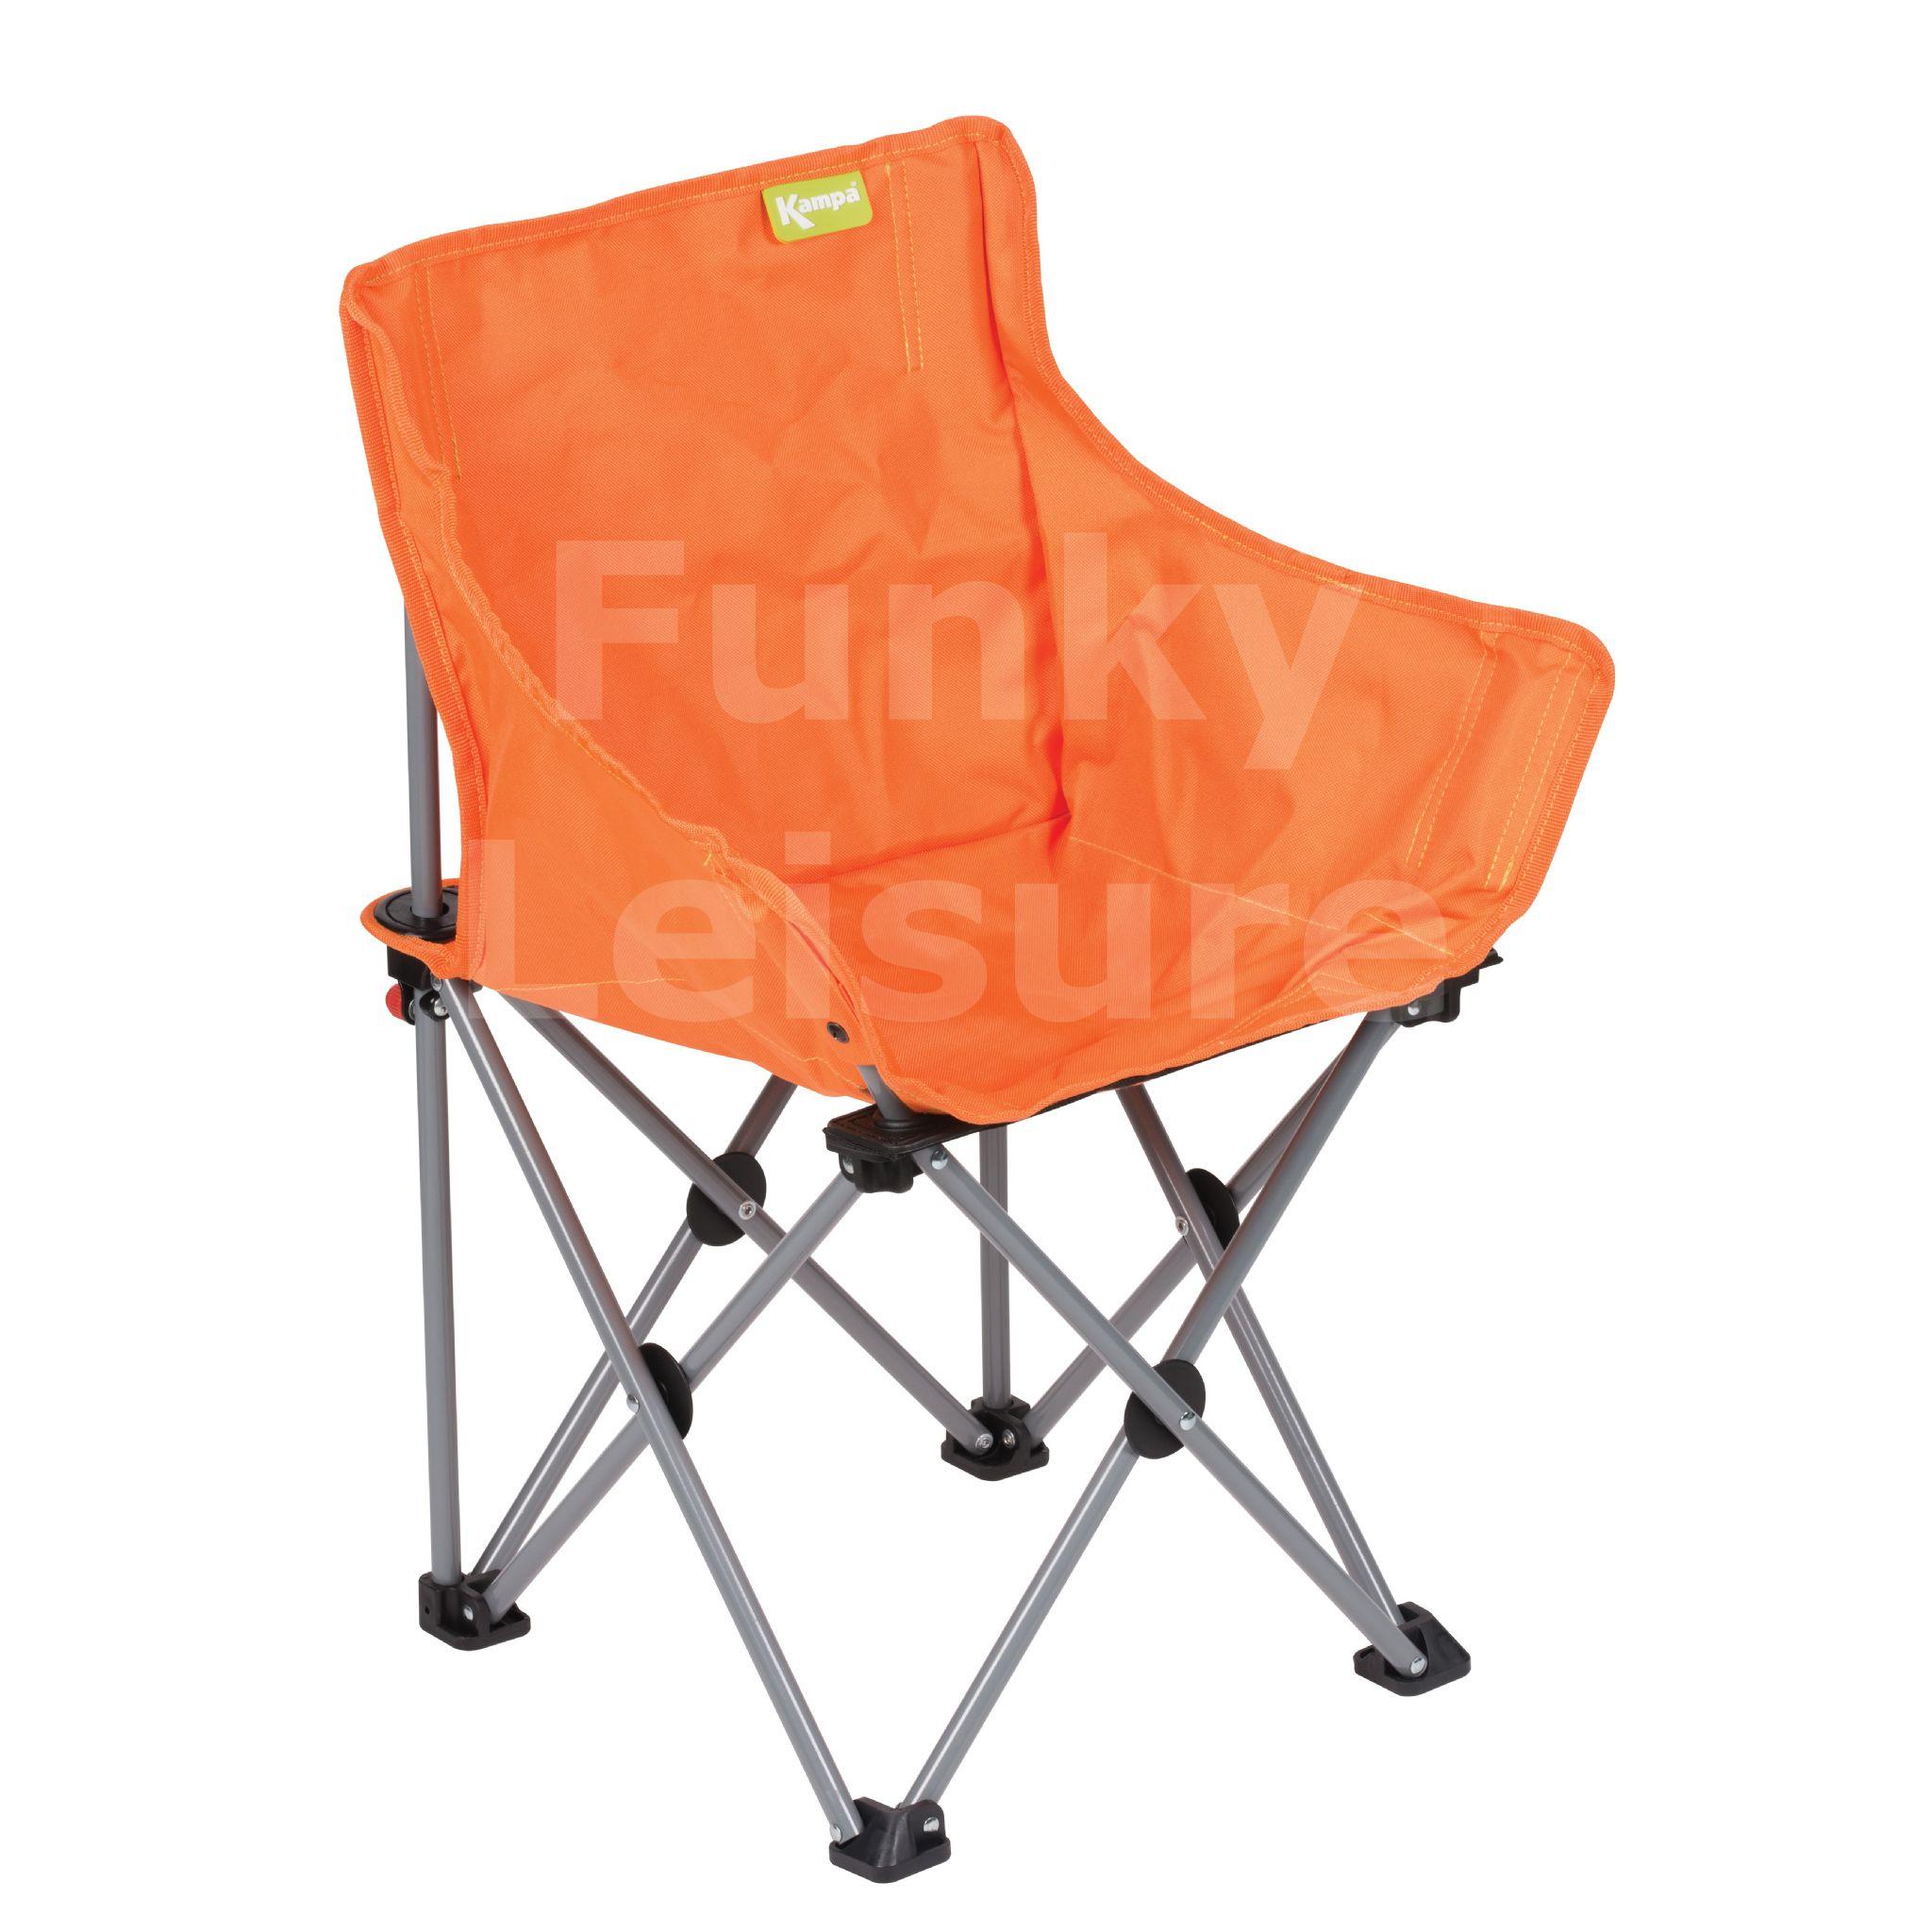 Kampa Mini Tub Kids Camp Chair Bright Orange